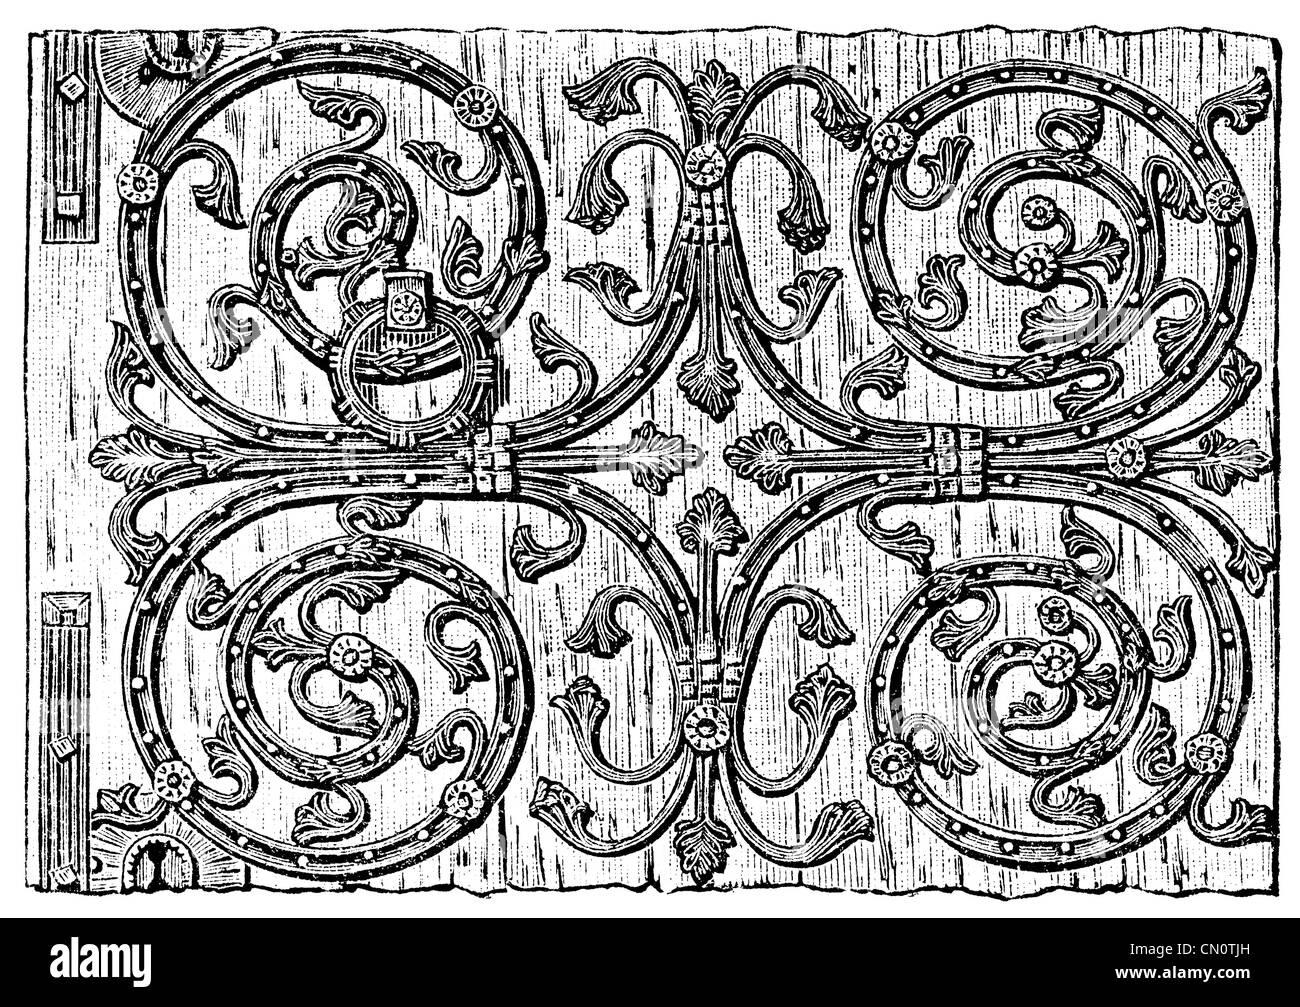 Door Fittings, Liege, 13th century. Publication of the book 'Meyers Konversations-Lexikon', Volume 7, Leipzig, - Stock Image